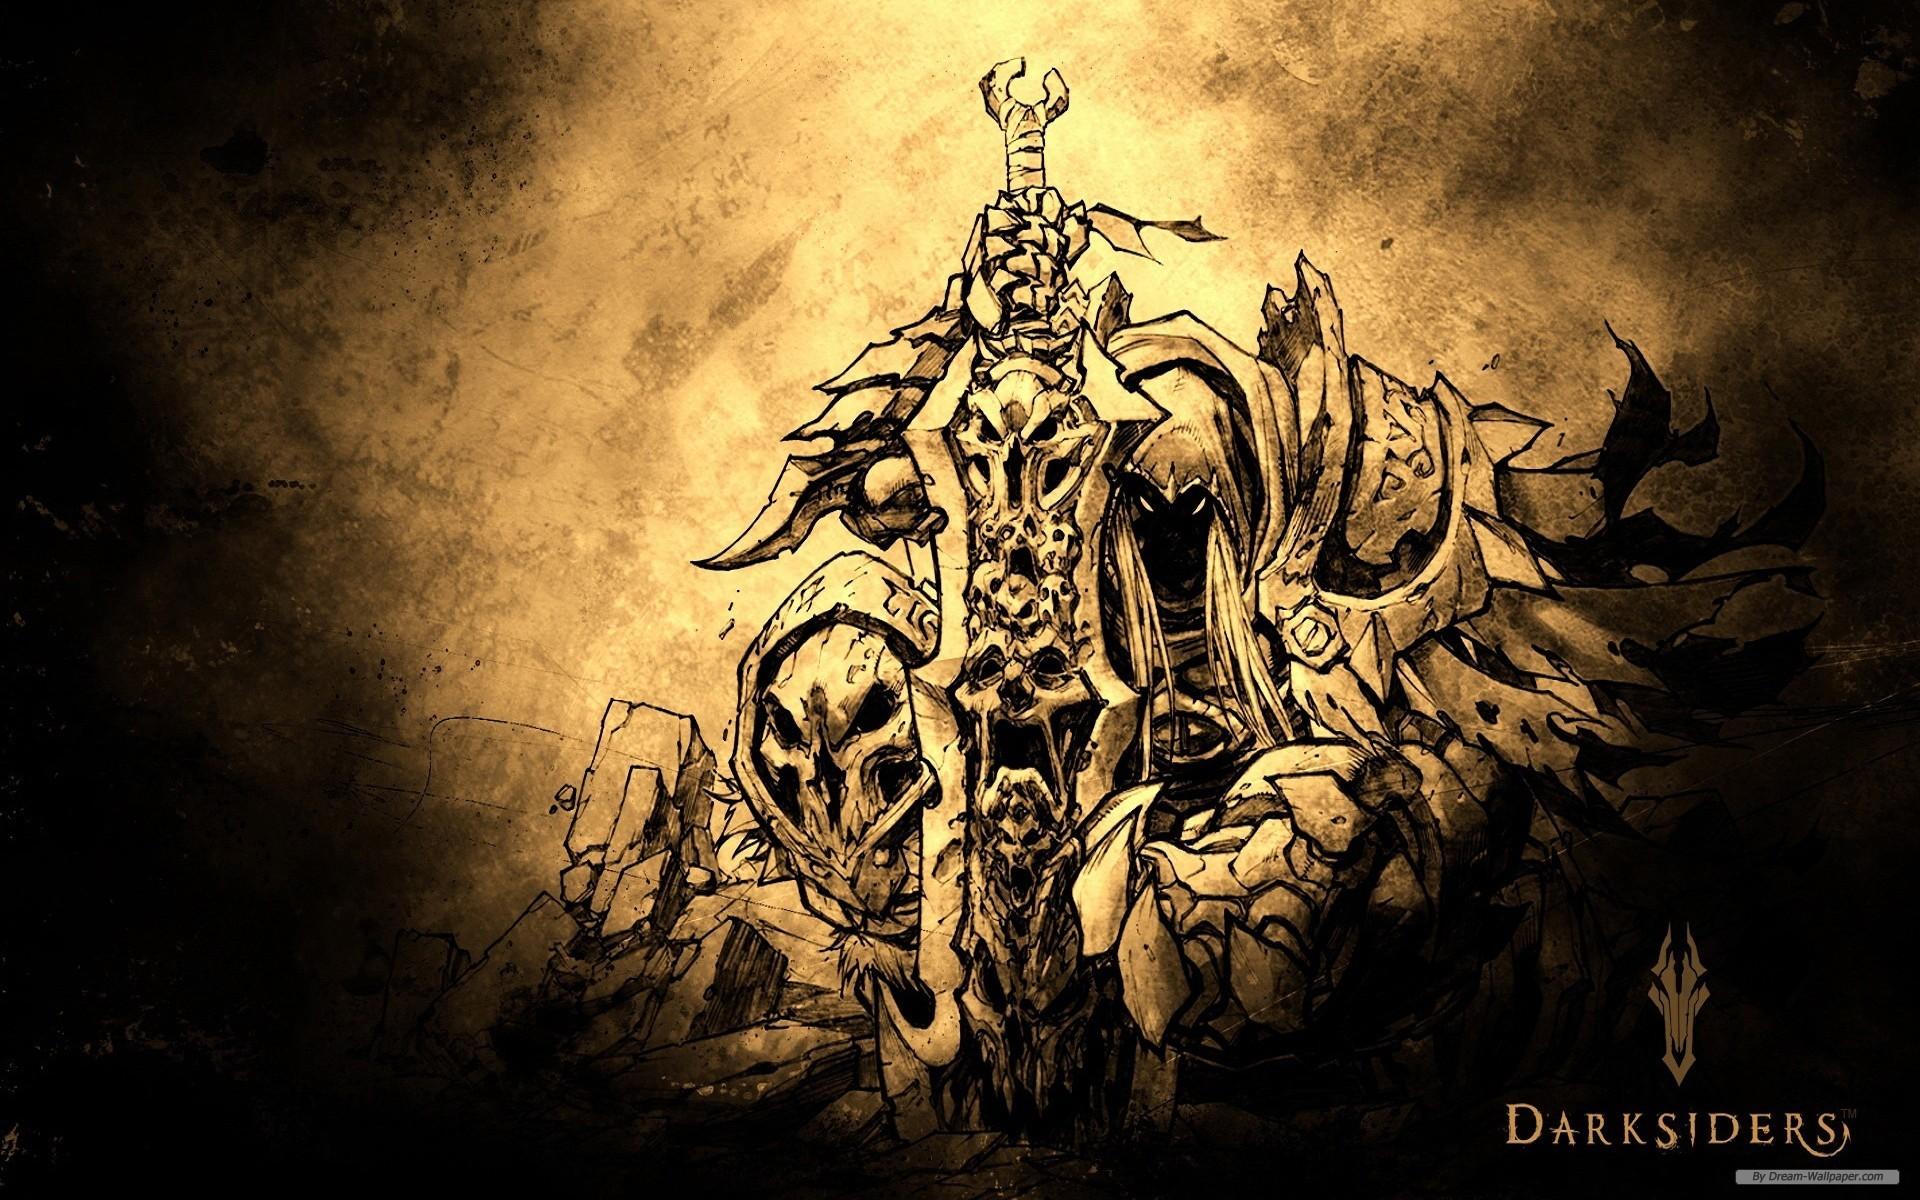 Darksiders wallpaper   781499 1920x1200